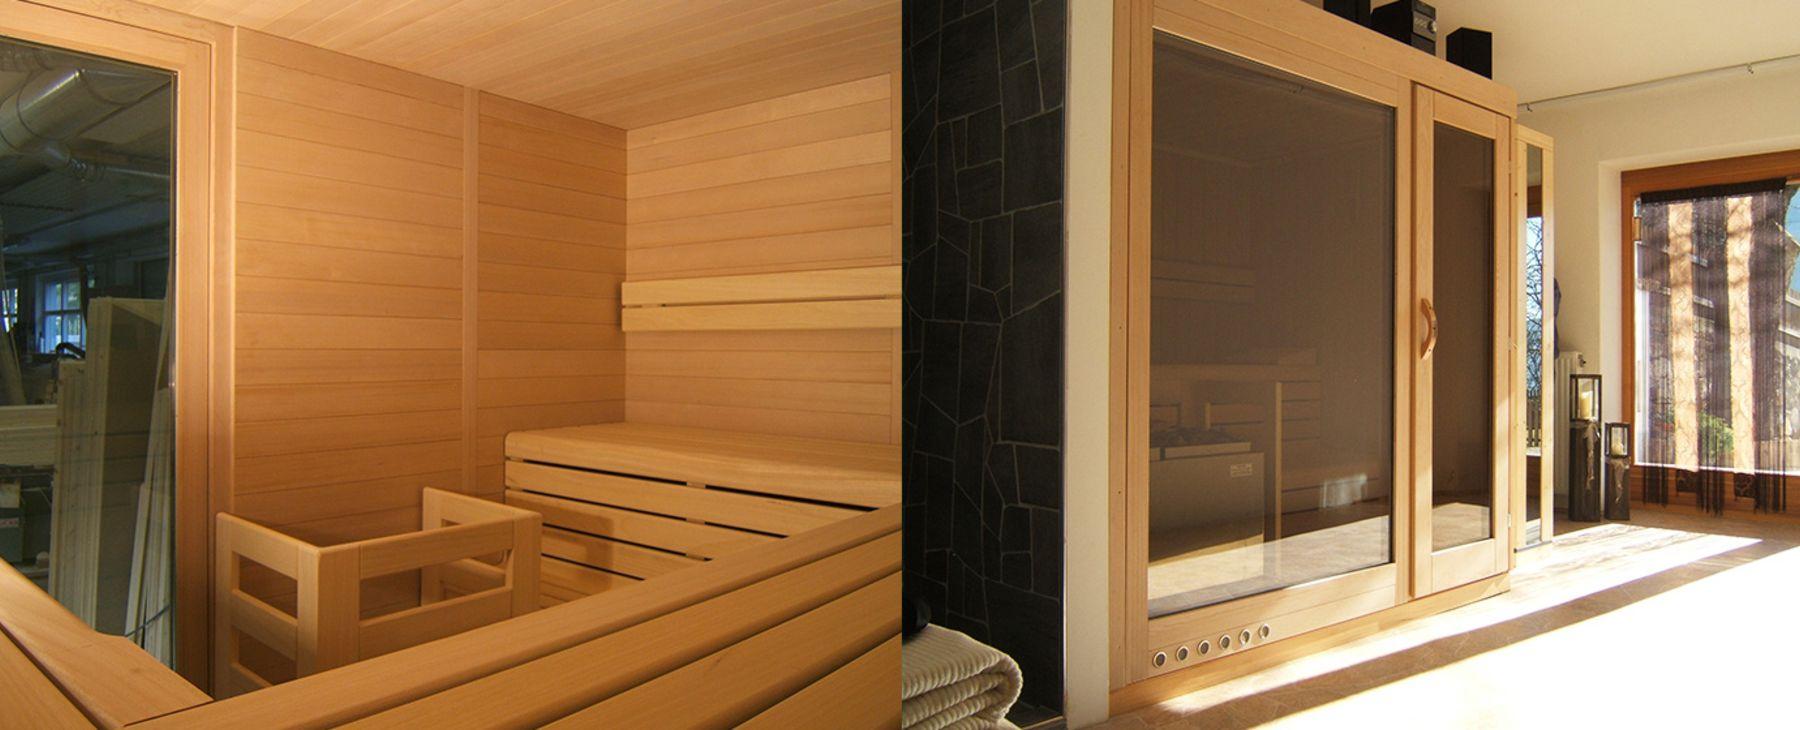 Prezzi saune da casa idee di design per la casa - Saune da casa prezzi ...